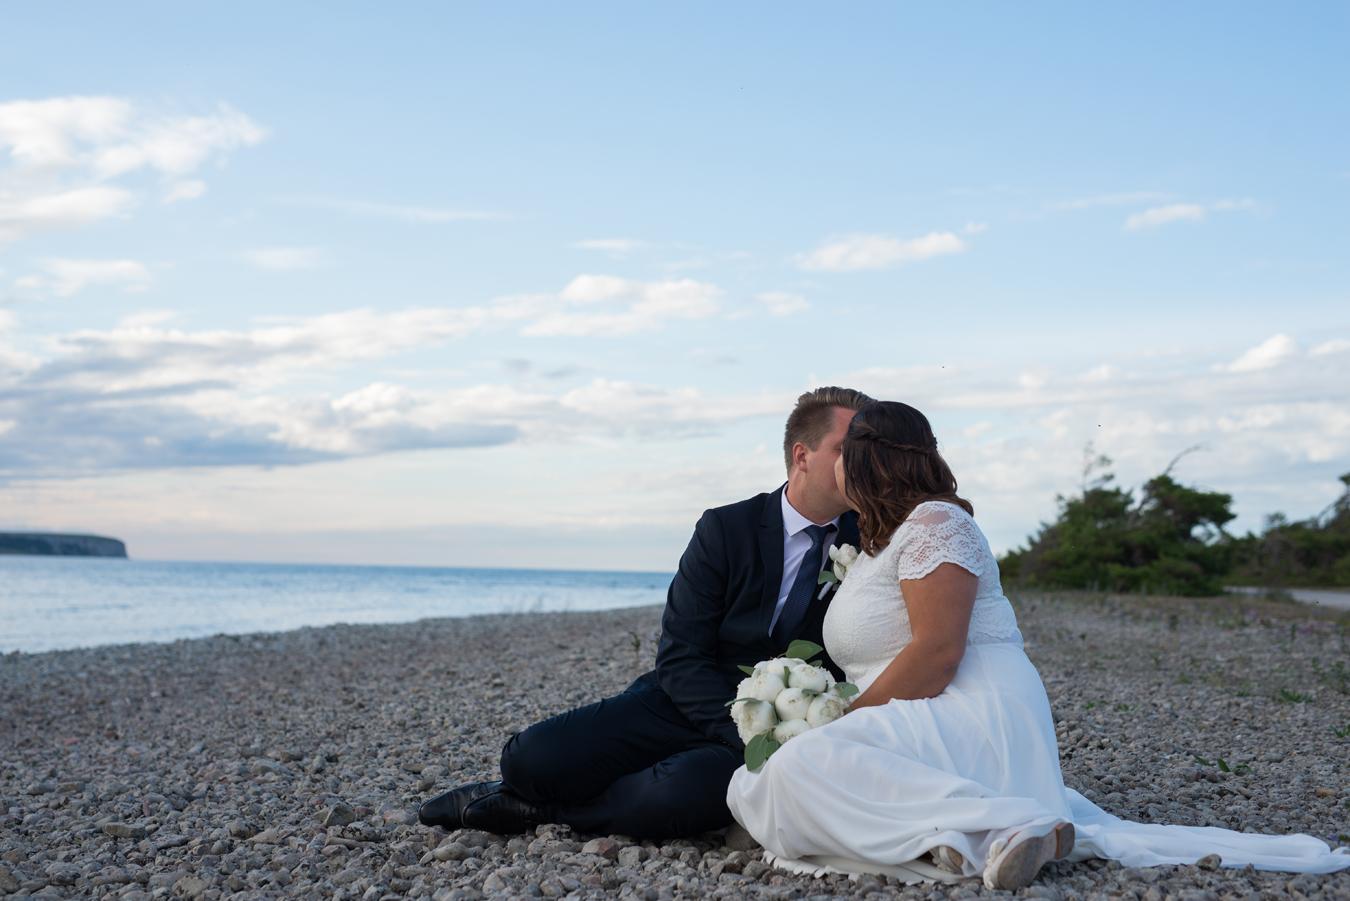 095-bröllopsfotograf-gotland-ekstakusten-neas-fotografi.jpg